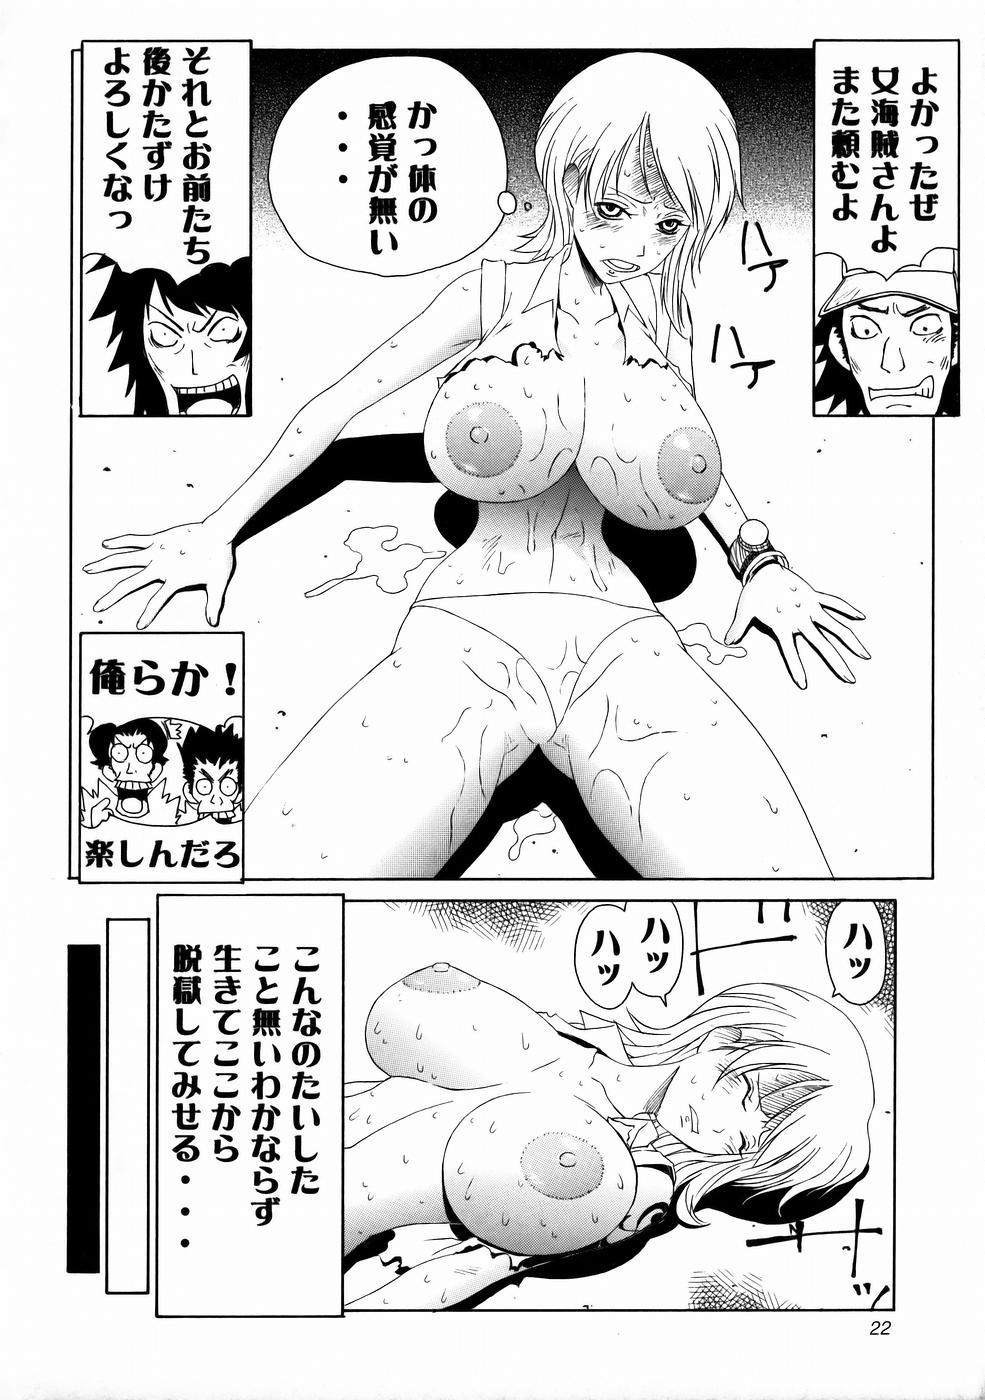 Mikisy Vol. 5 22